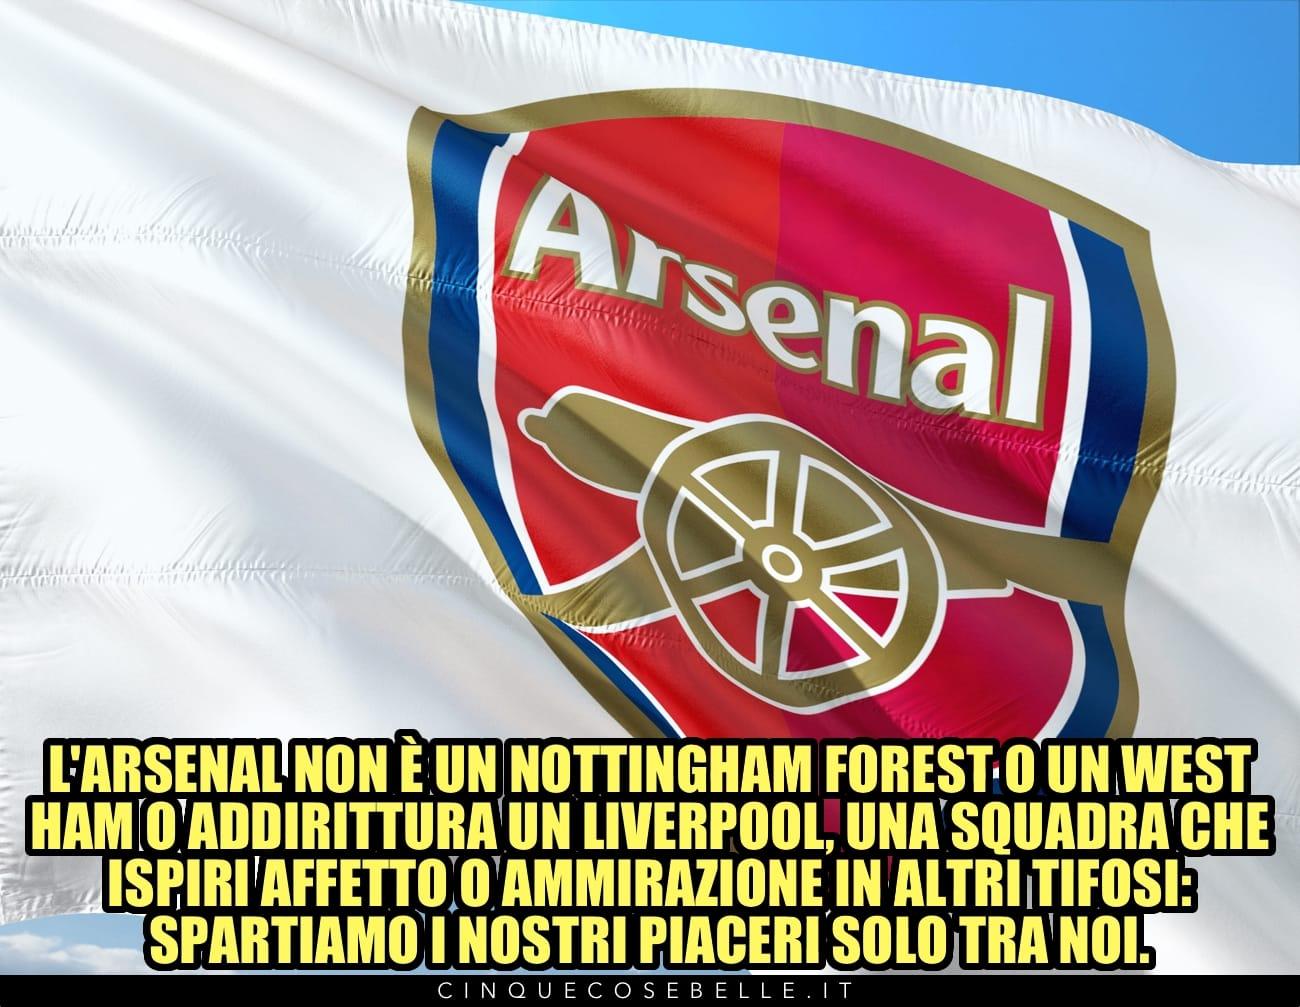 Tifare l'Arsenal per Nick Hornby